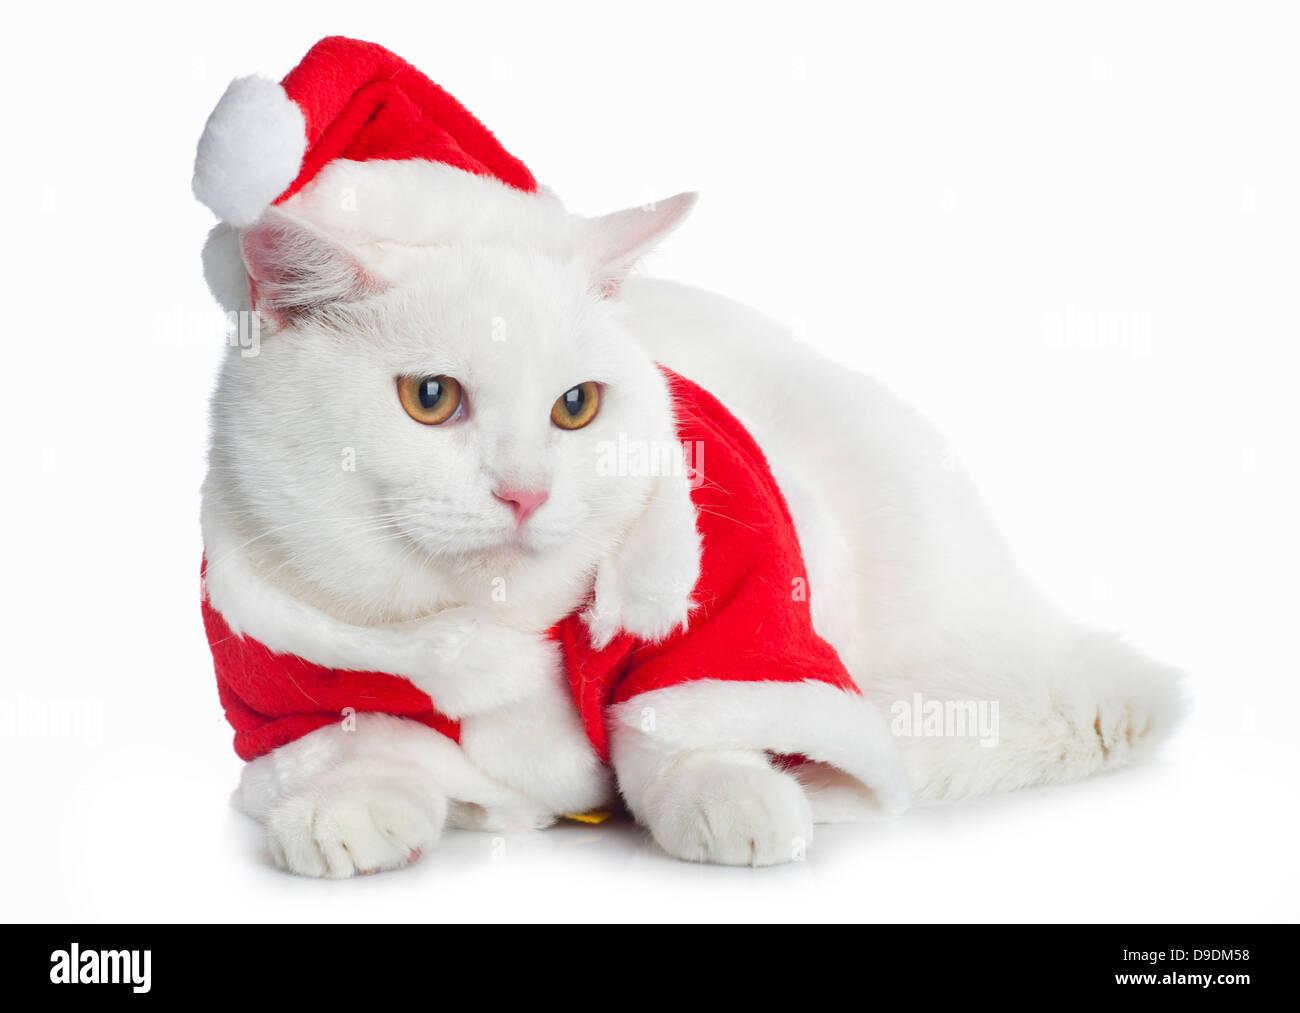 White Cat with yellow eyes on white background - Stock Image